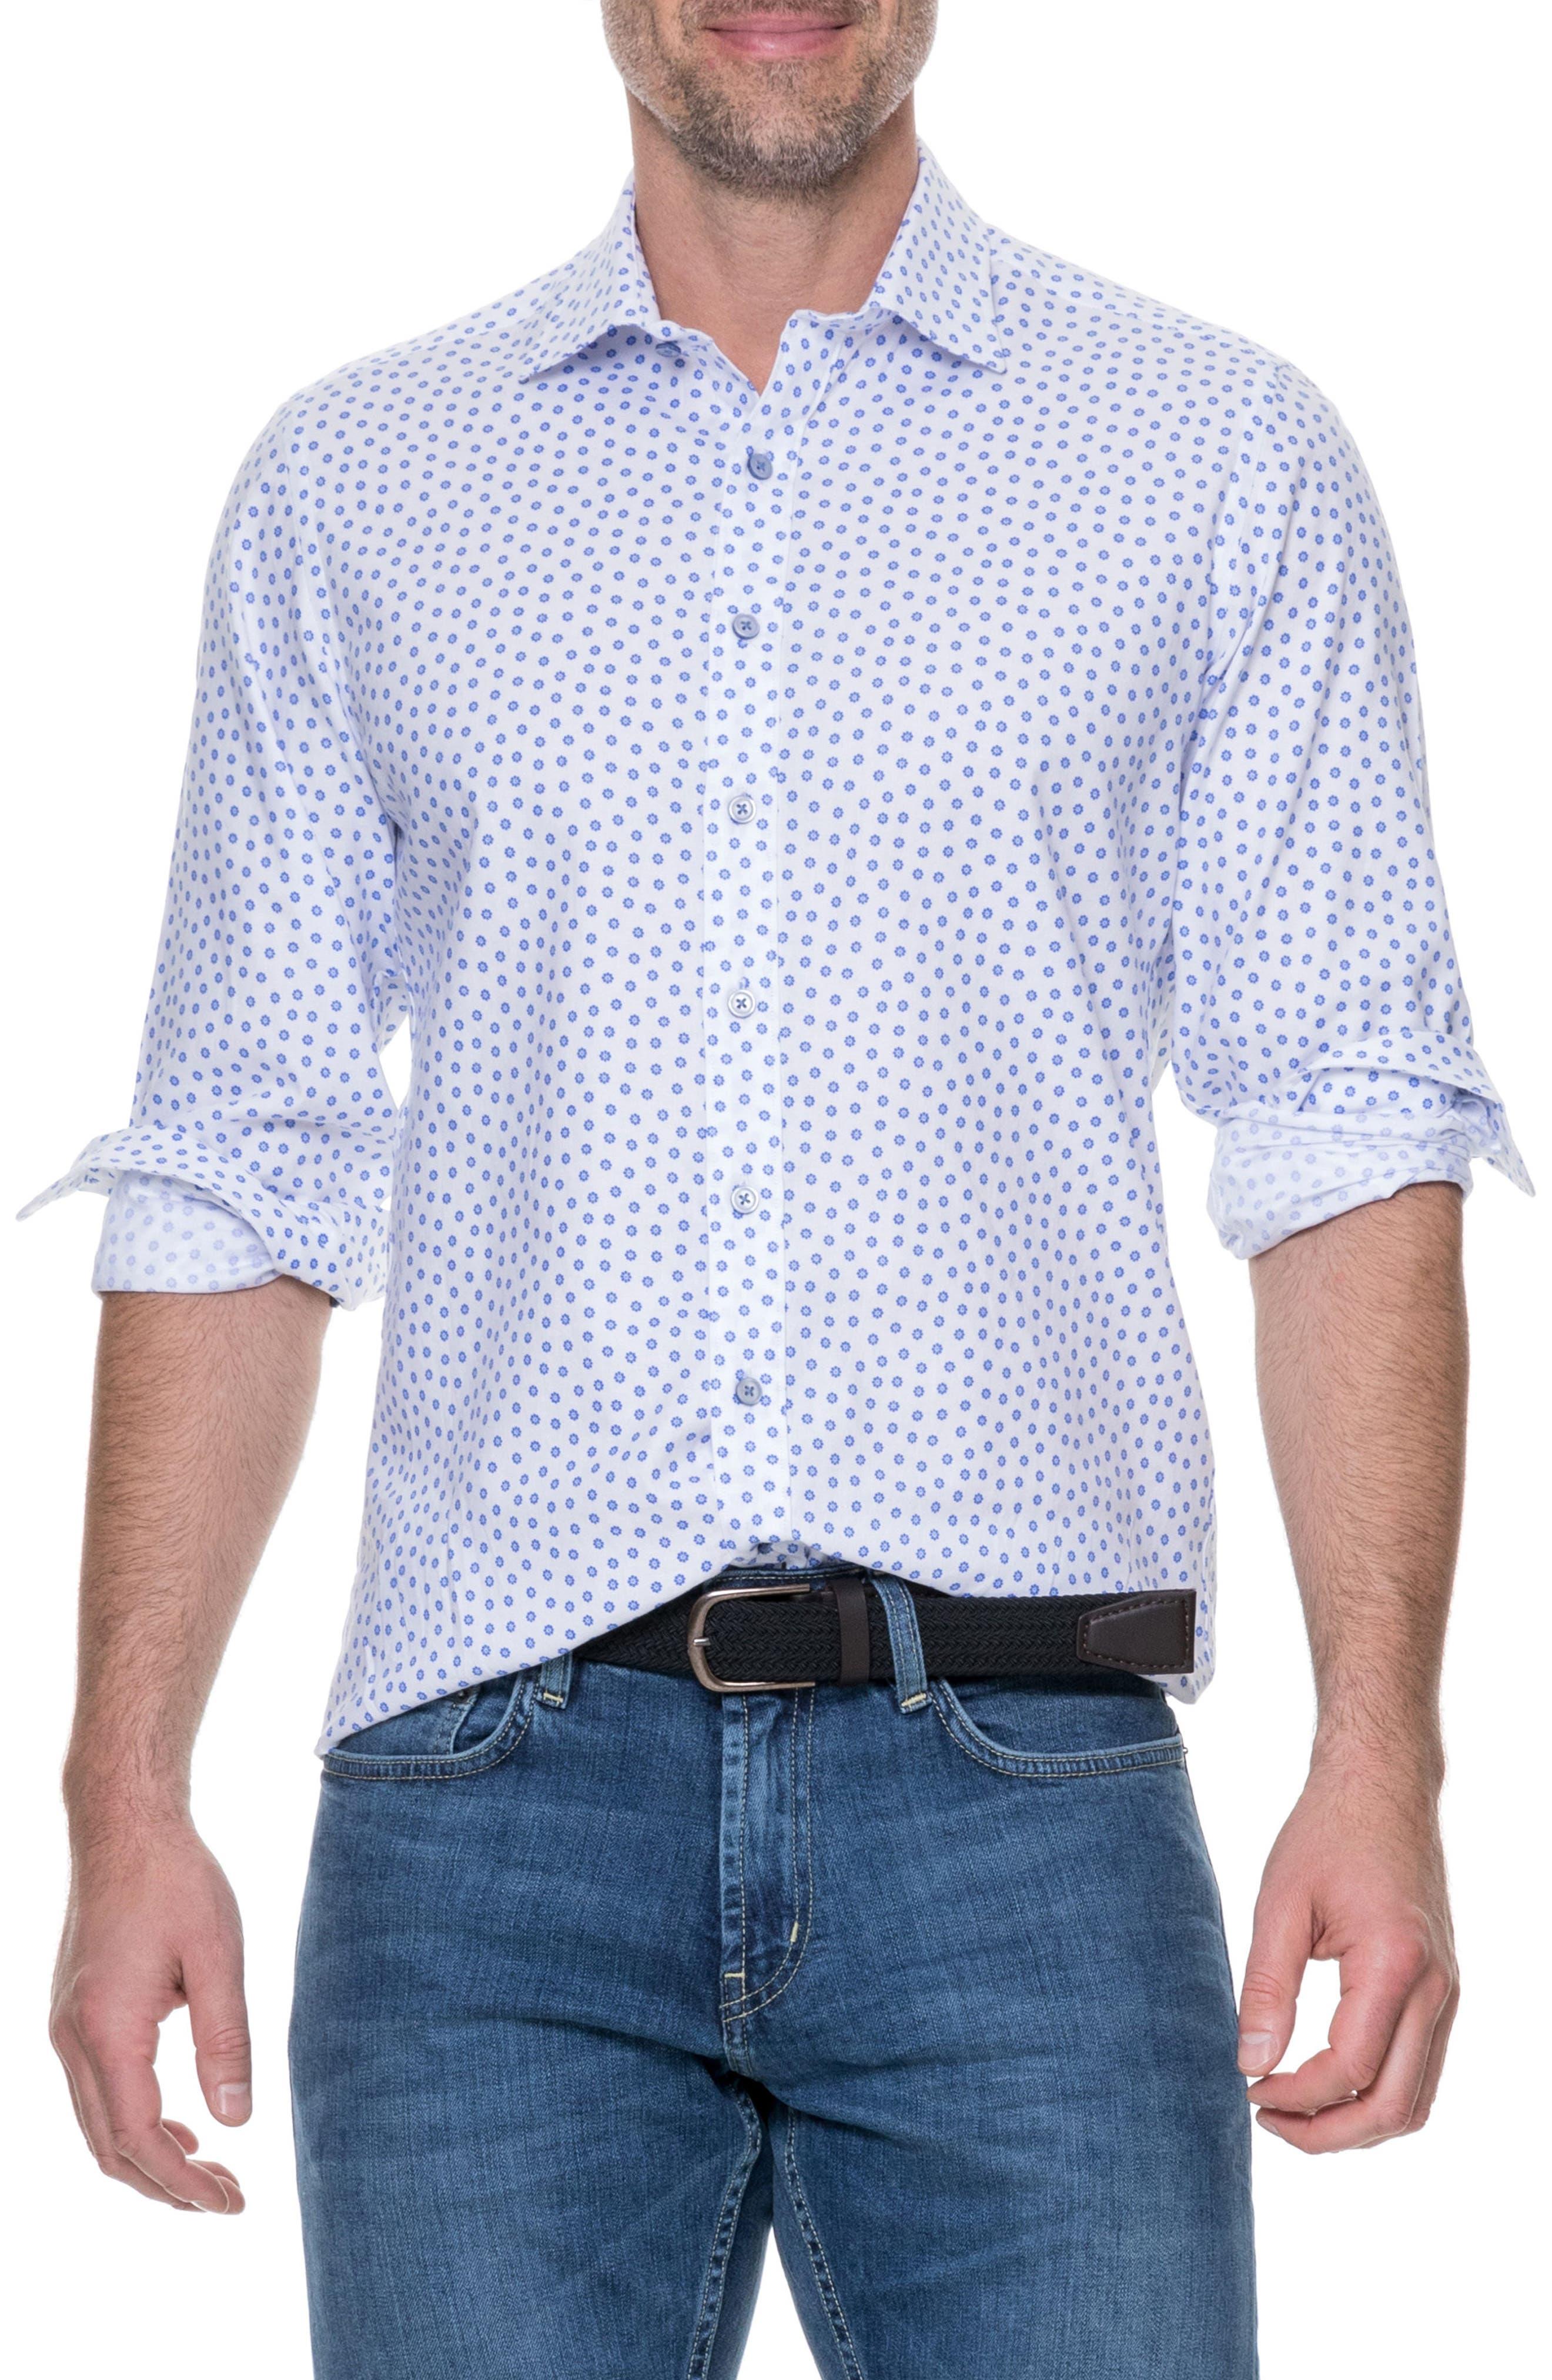 RODD & GUNN Drummond Regular Fit Sport Shirt, Main, color, 111